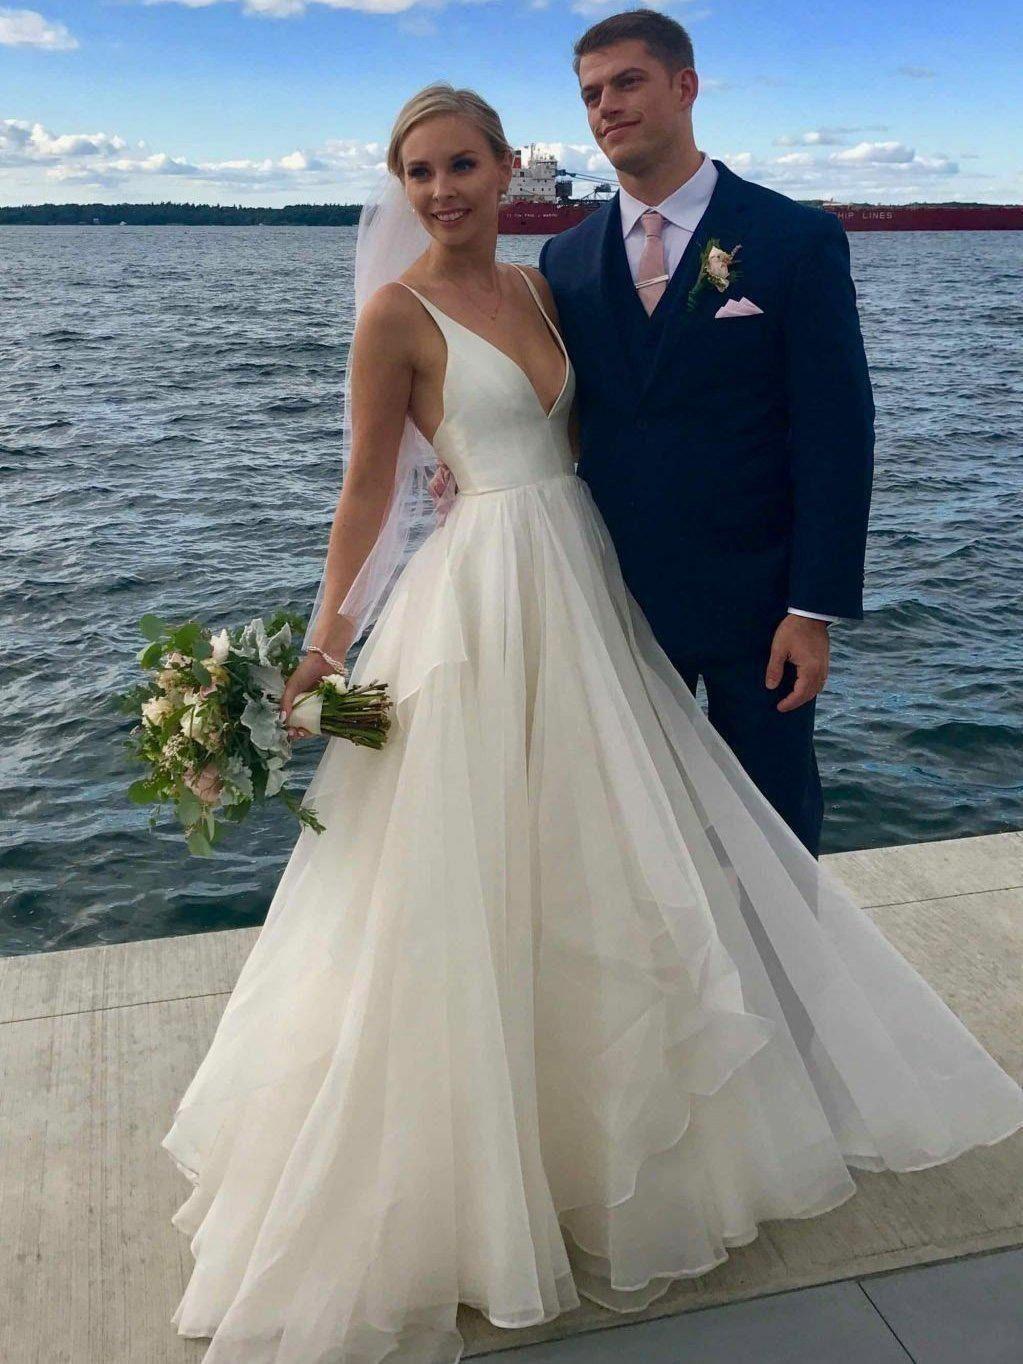 Casual wedding dresses with color  Spaghetti Strap Ivory Chiffon Beach Wedding Dresses Cheap V Neck